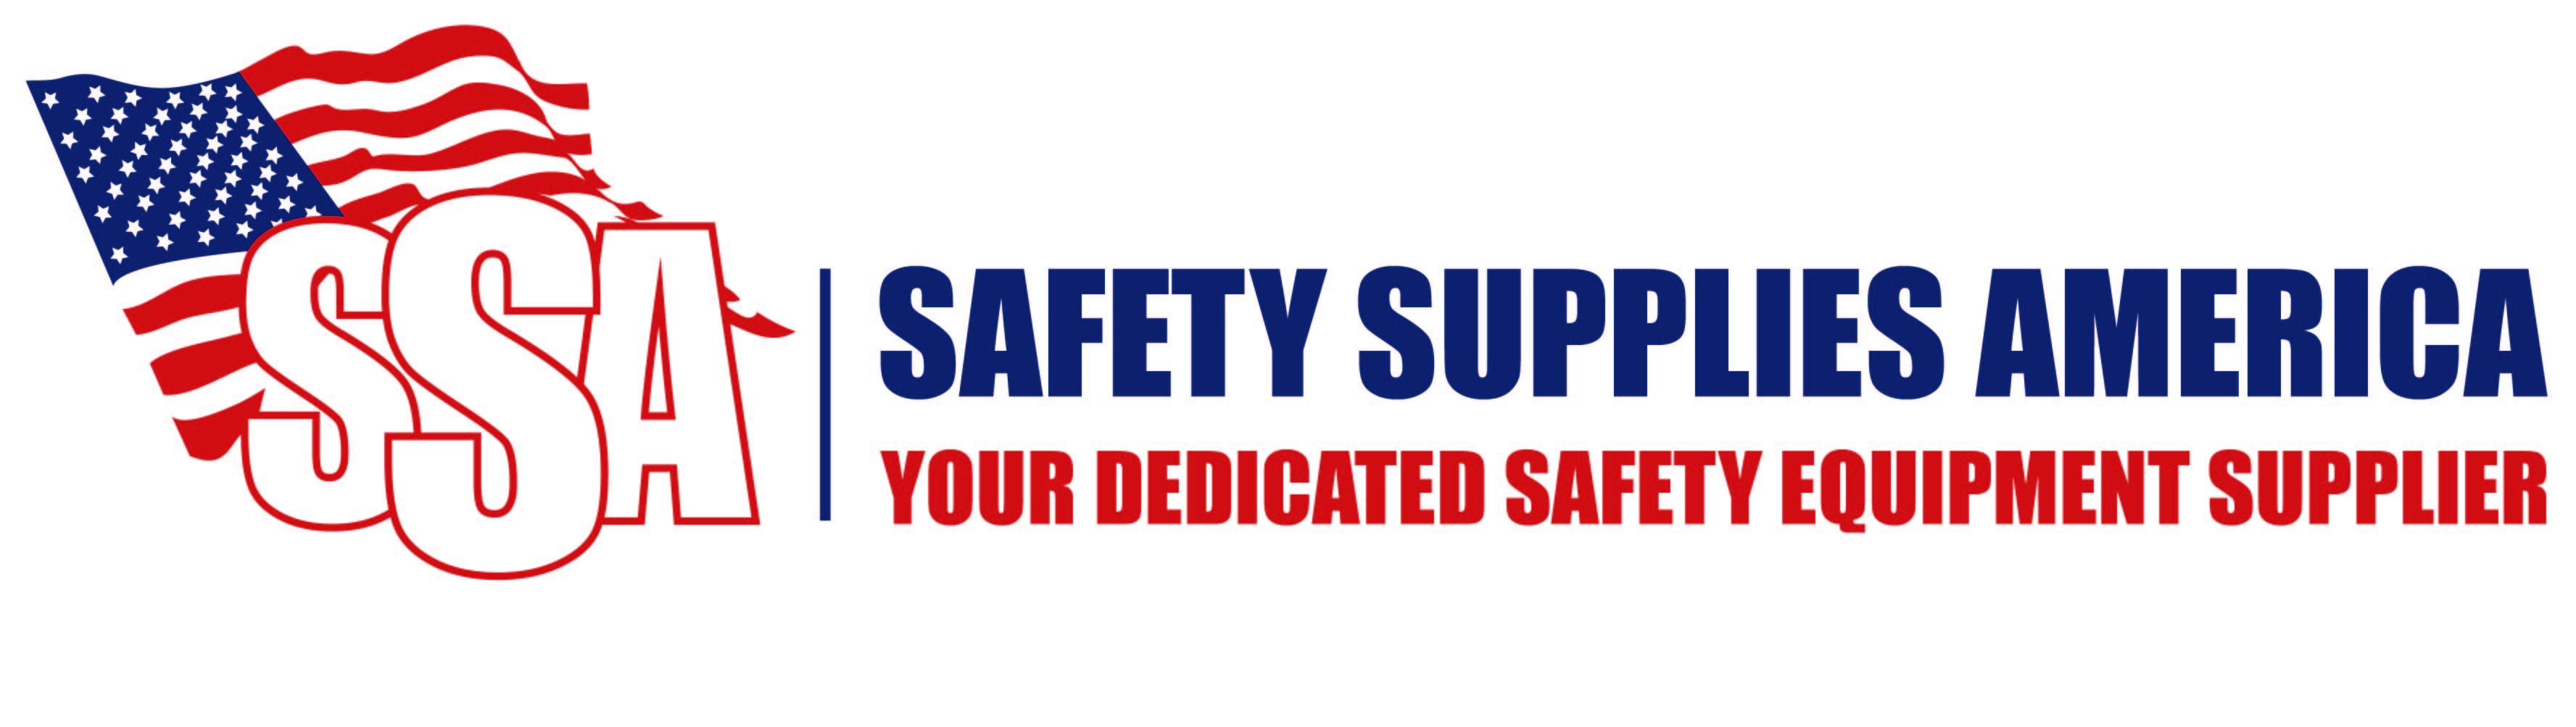 Safety Supplies America